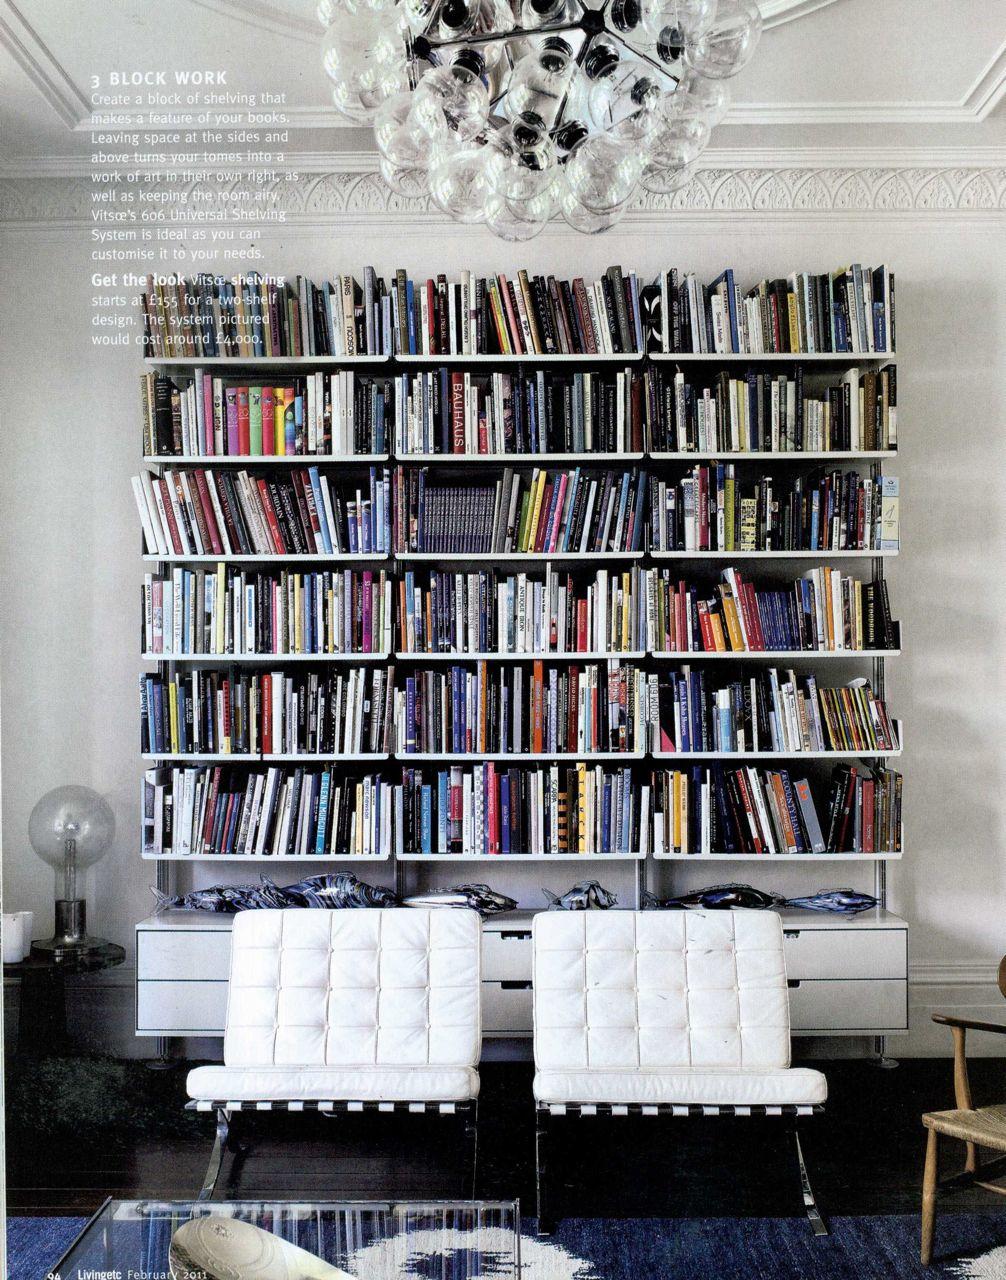 livingetc_feb2011_barcelona_bookshelf